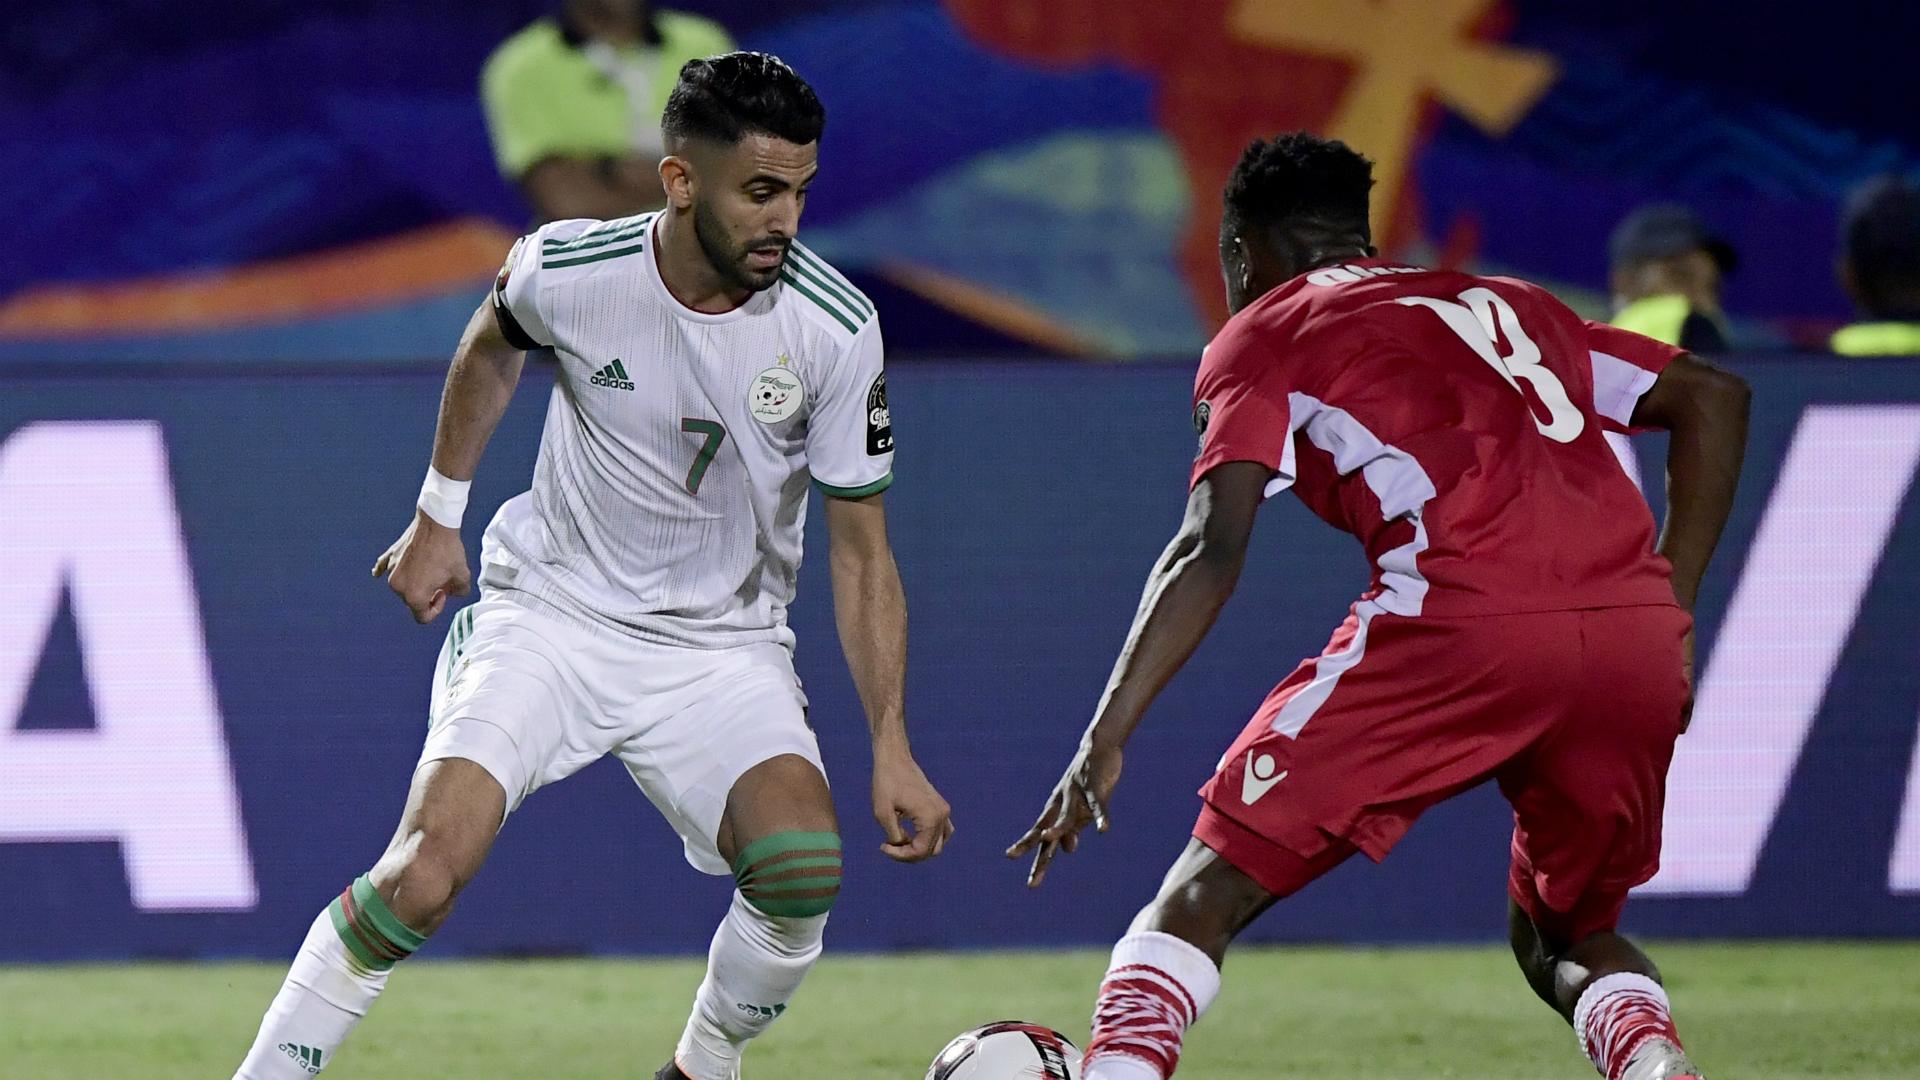 Afcon 2019: Algeria must focus less on Mahrez – Belmadi